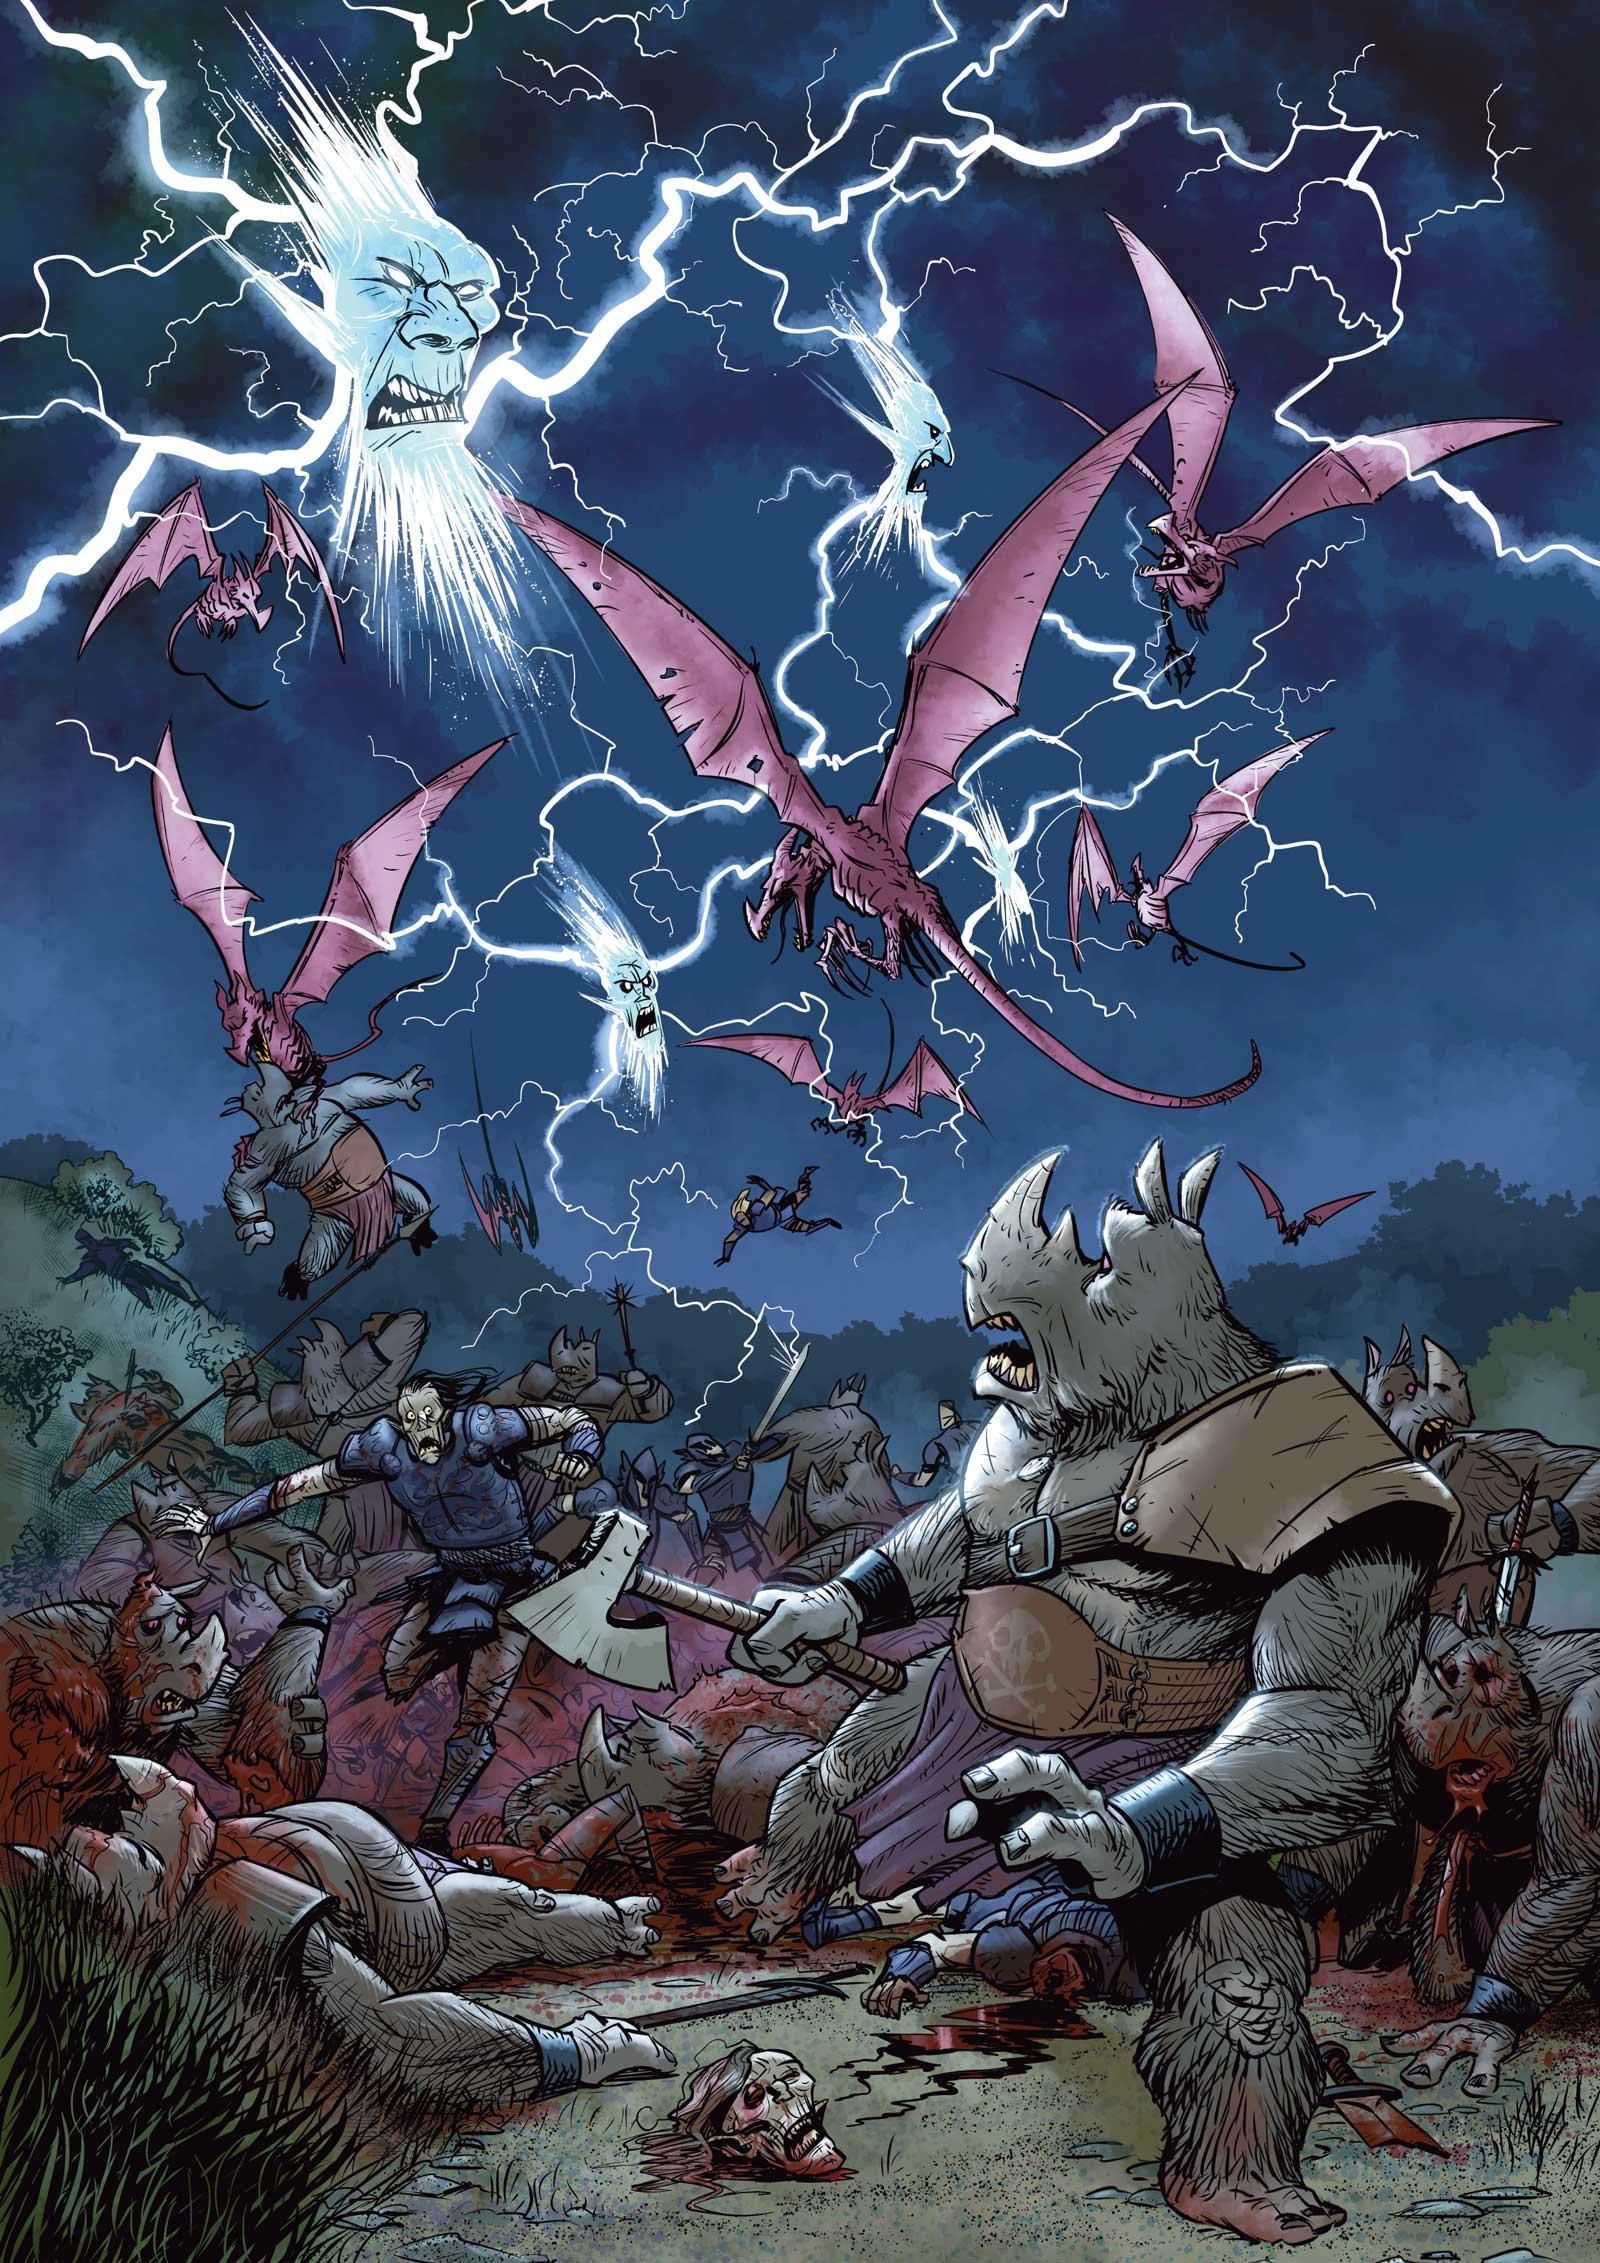 Steve Jackson's The Trolltooth Wars - Ford